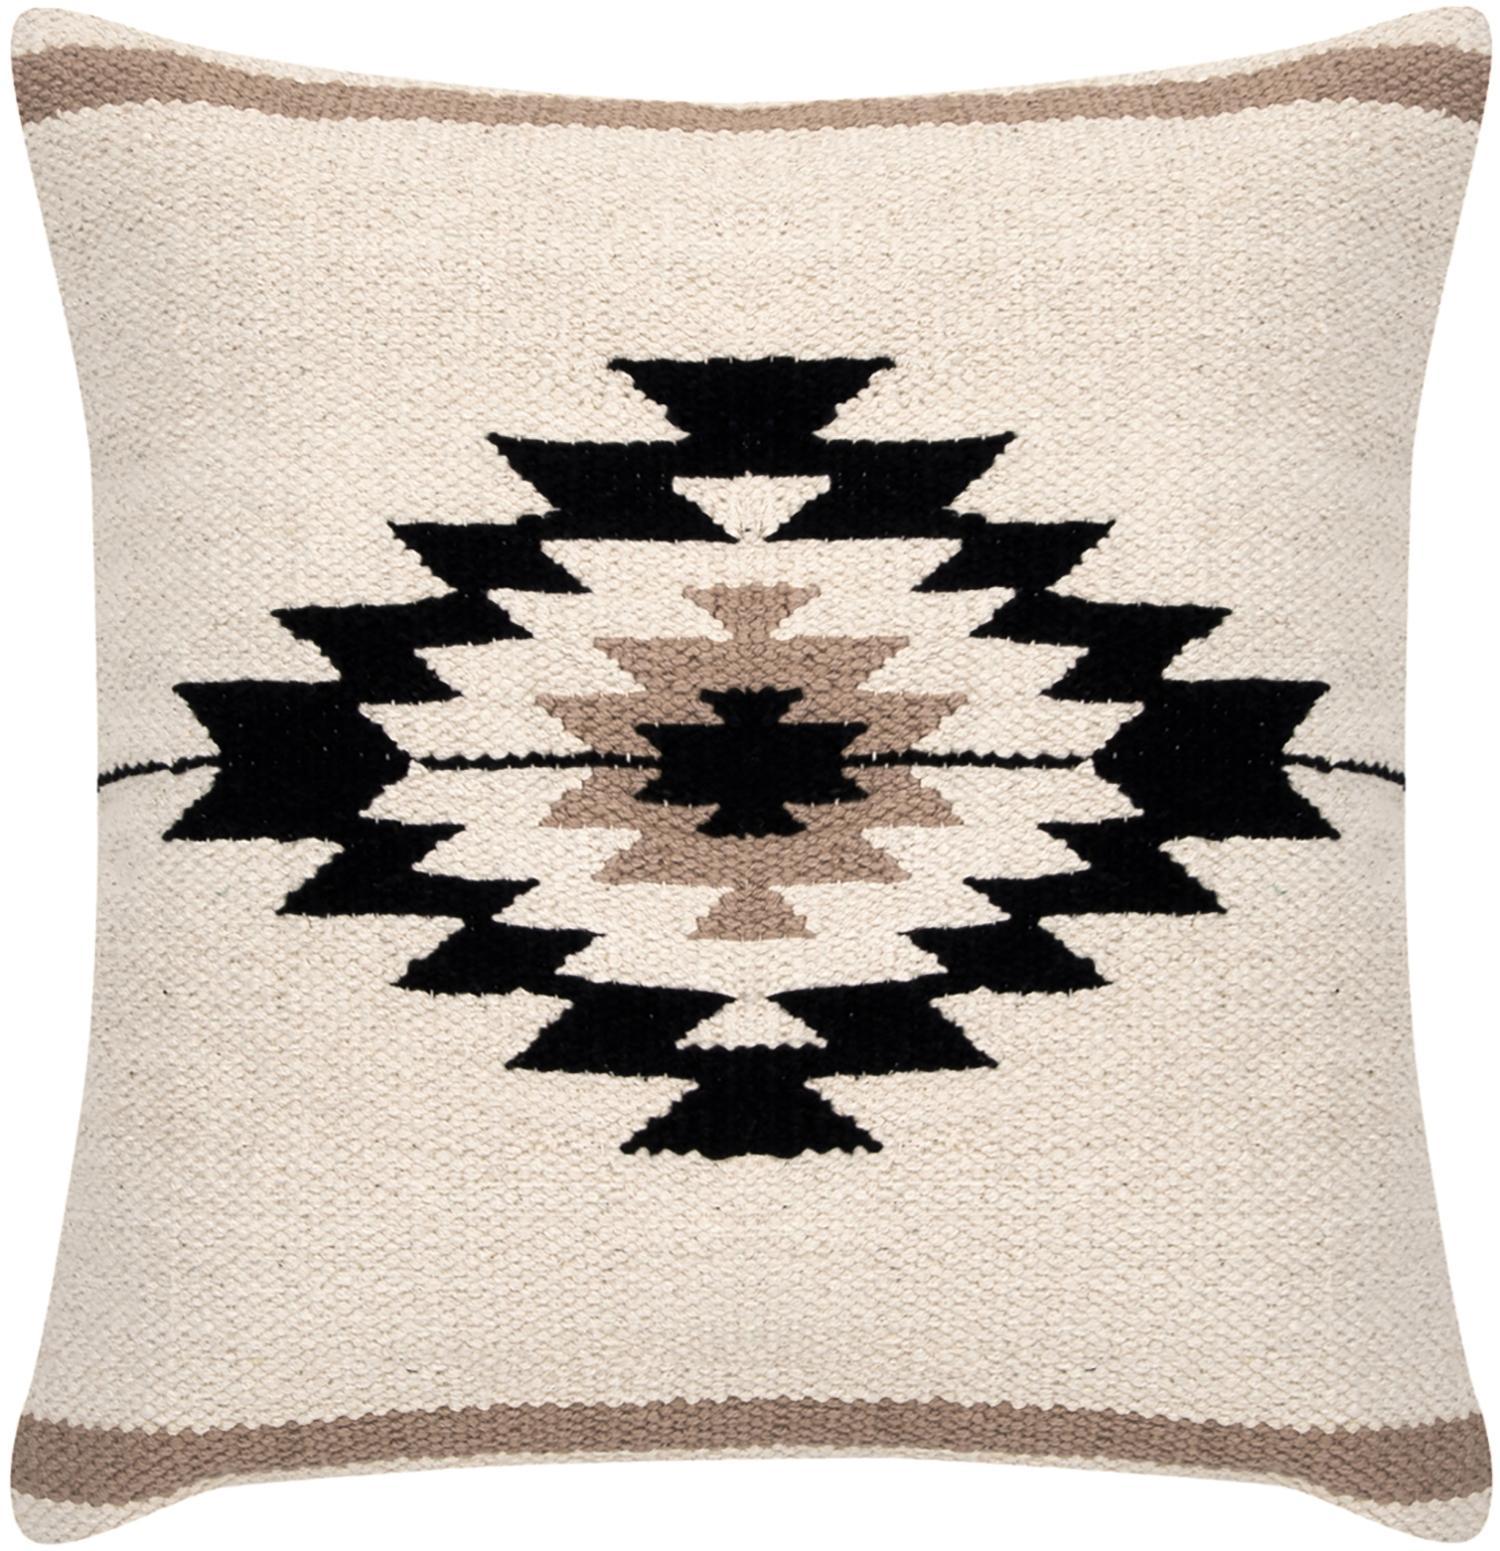 Federa arredo etnica Toluca, Cotone, Nero, beige, taupe, Larg. 45 x Lung. 45 cm